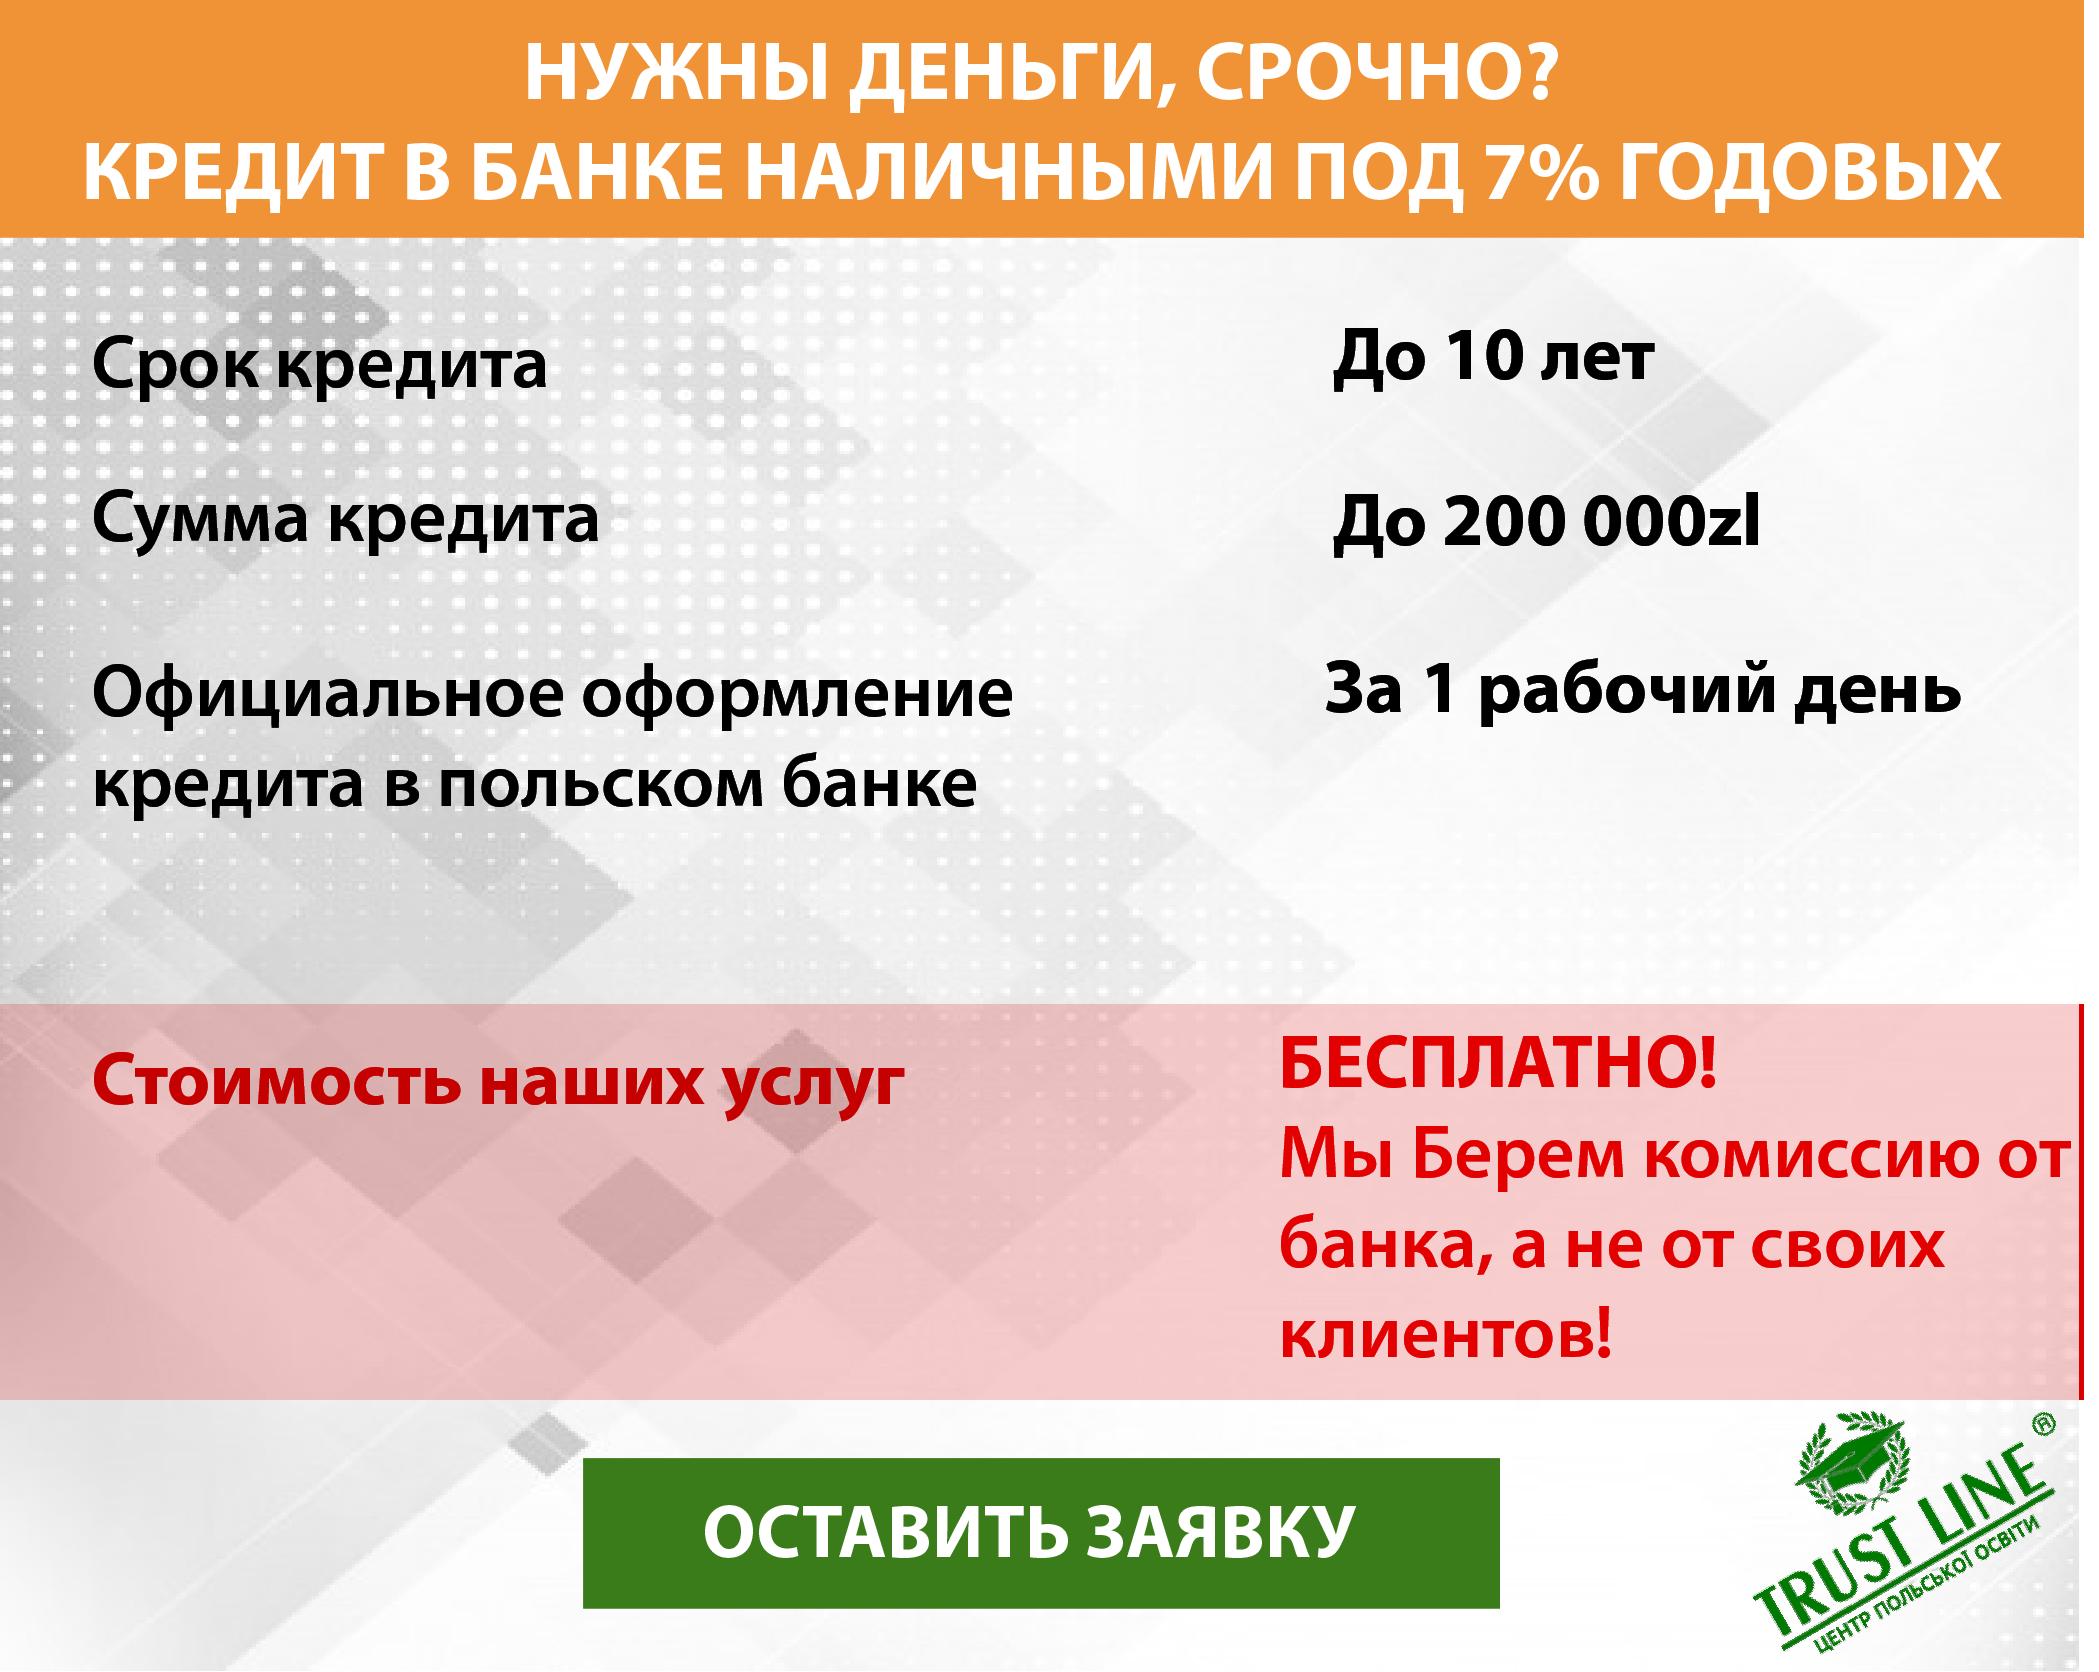 Кредиты в москве срочно skip-start.ru